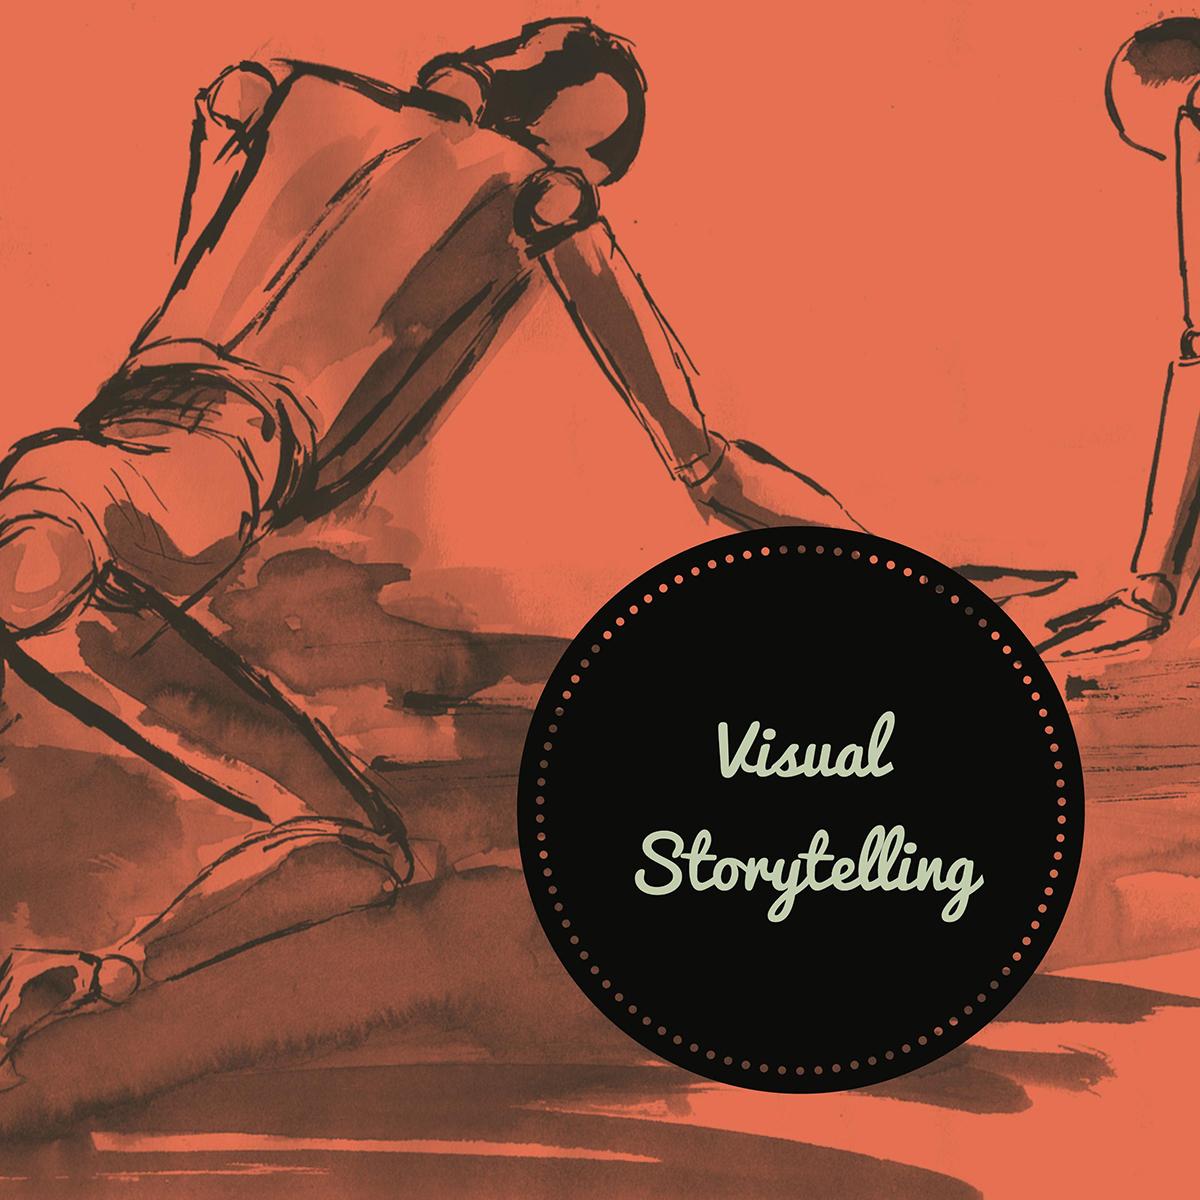 visual storytelling maga design course